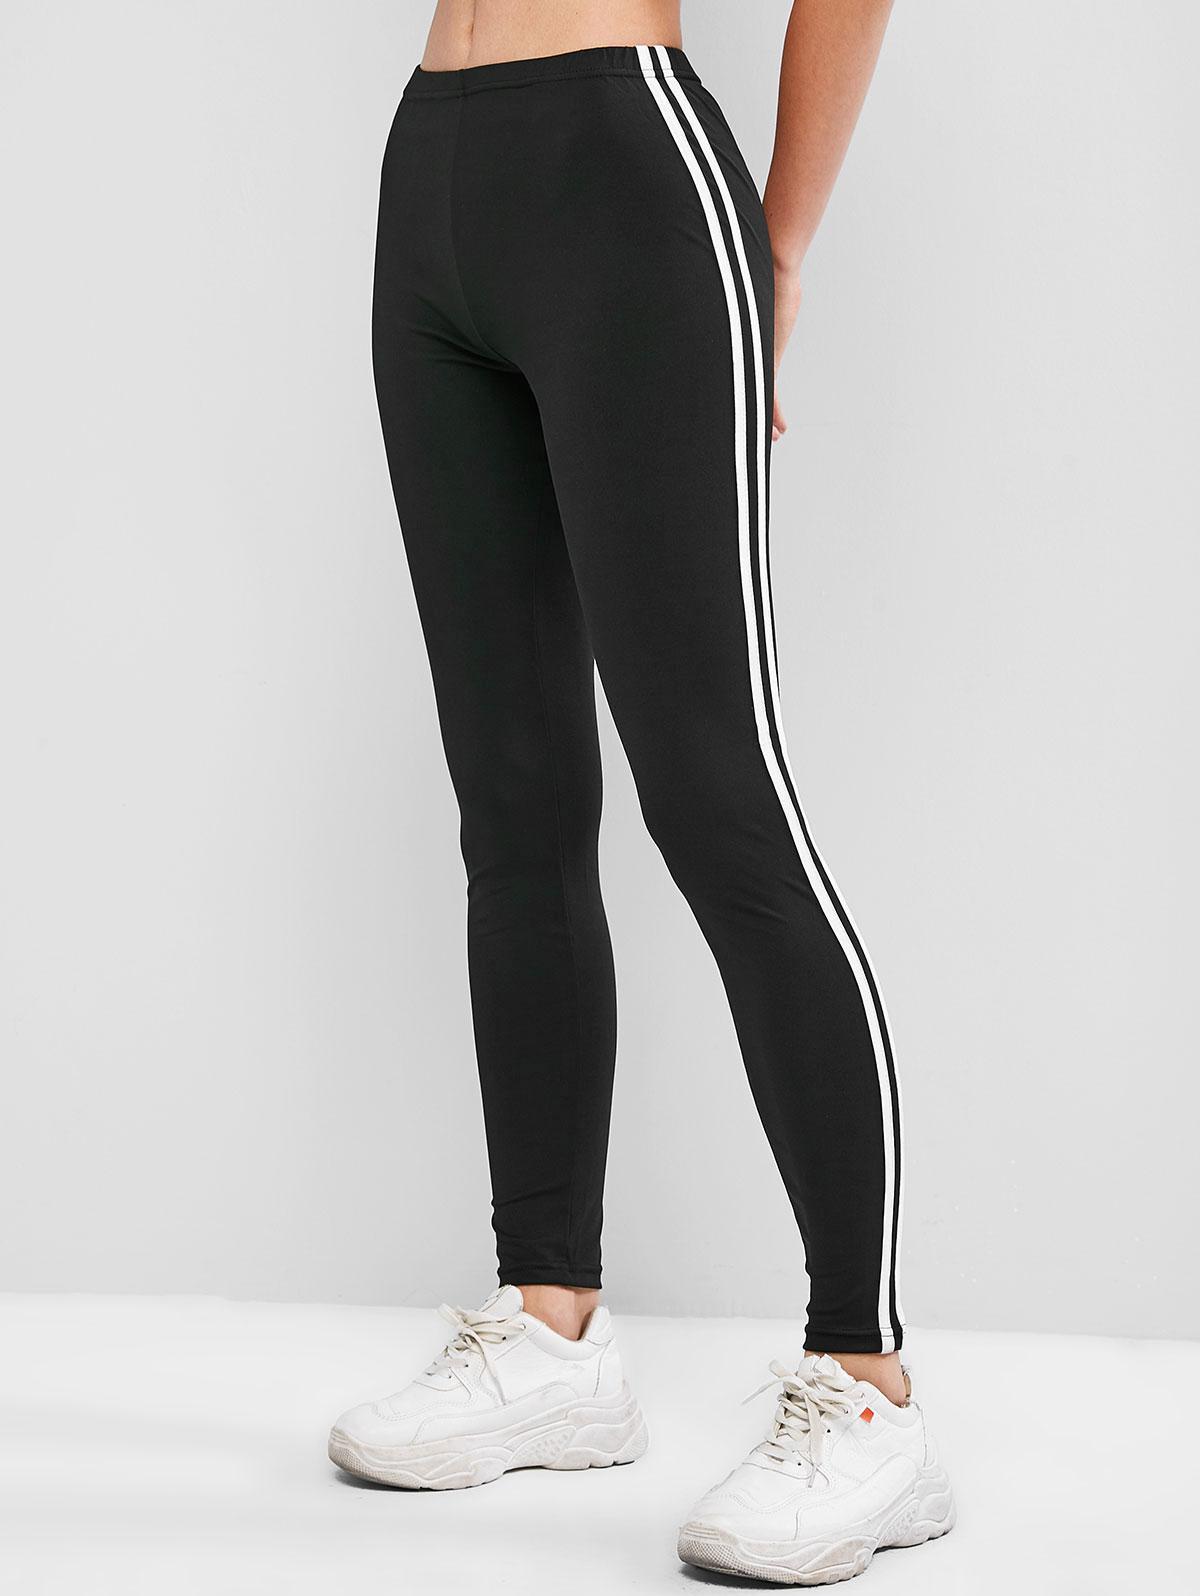 Contrast Striped Tapered Skinny Leggings, Black